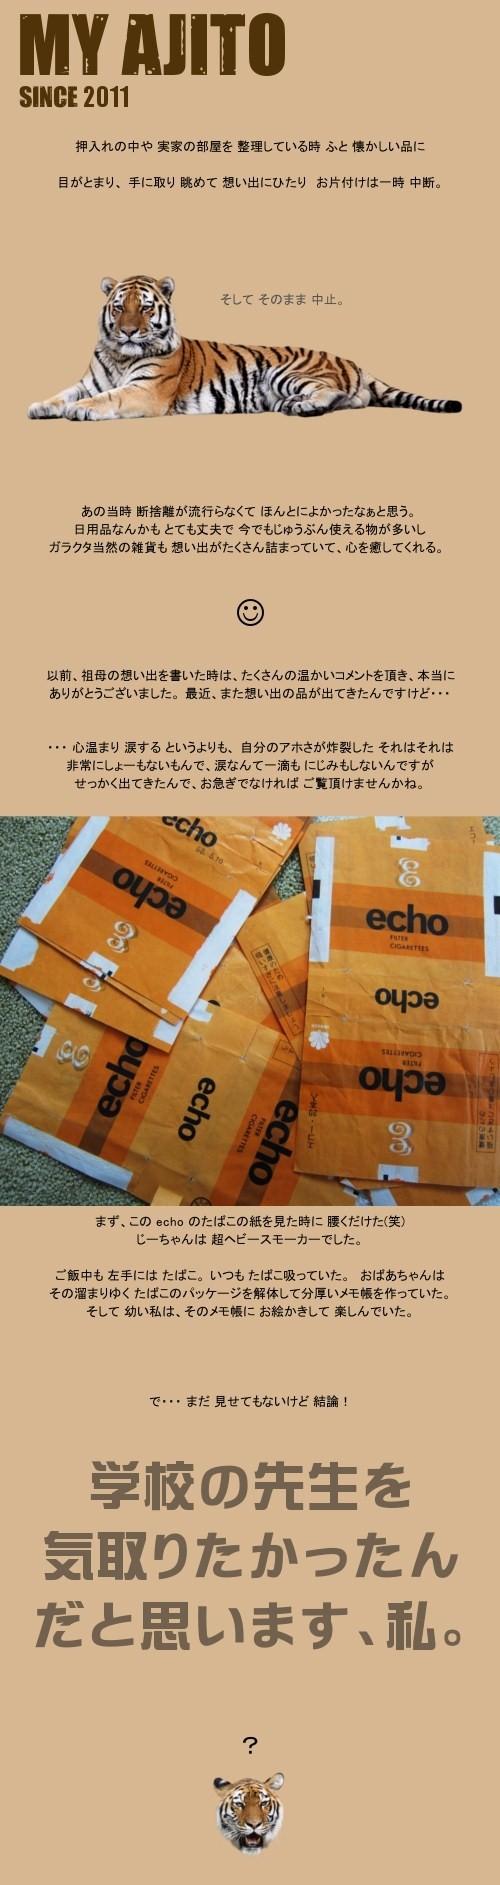 oshiba_1.jpg